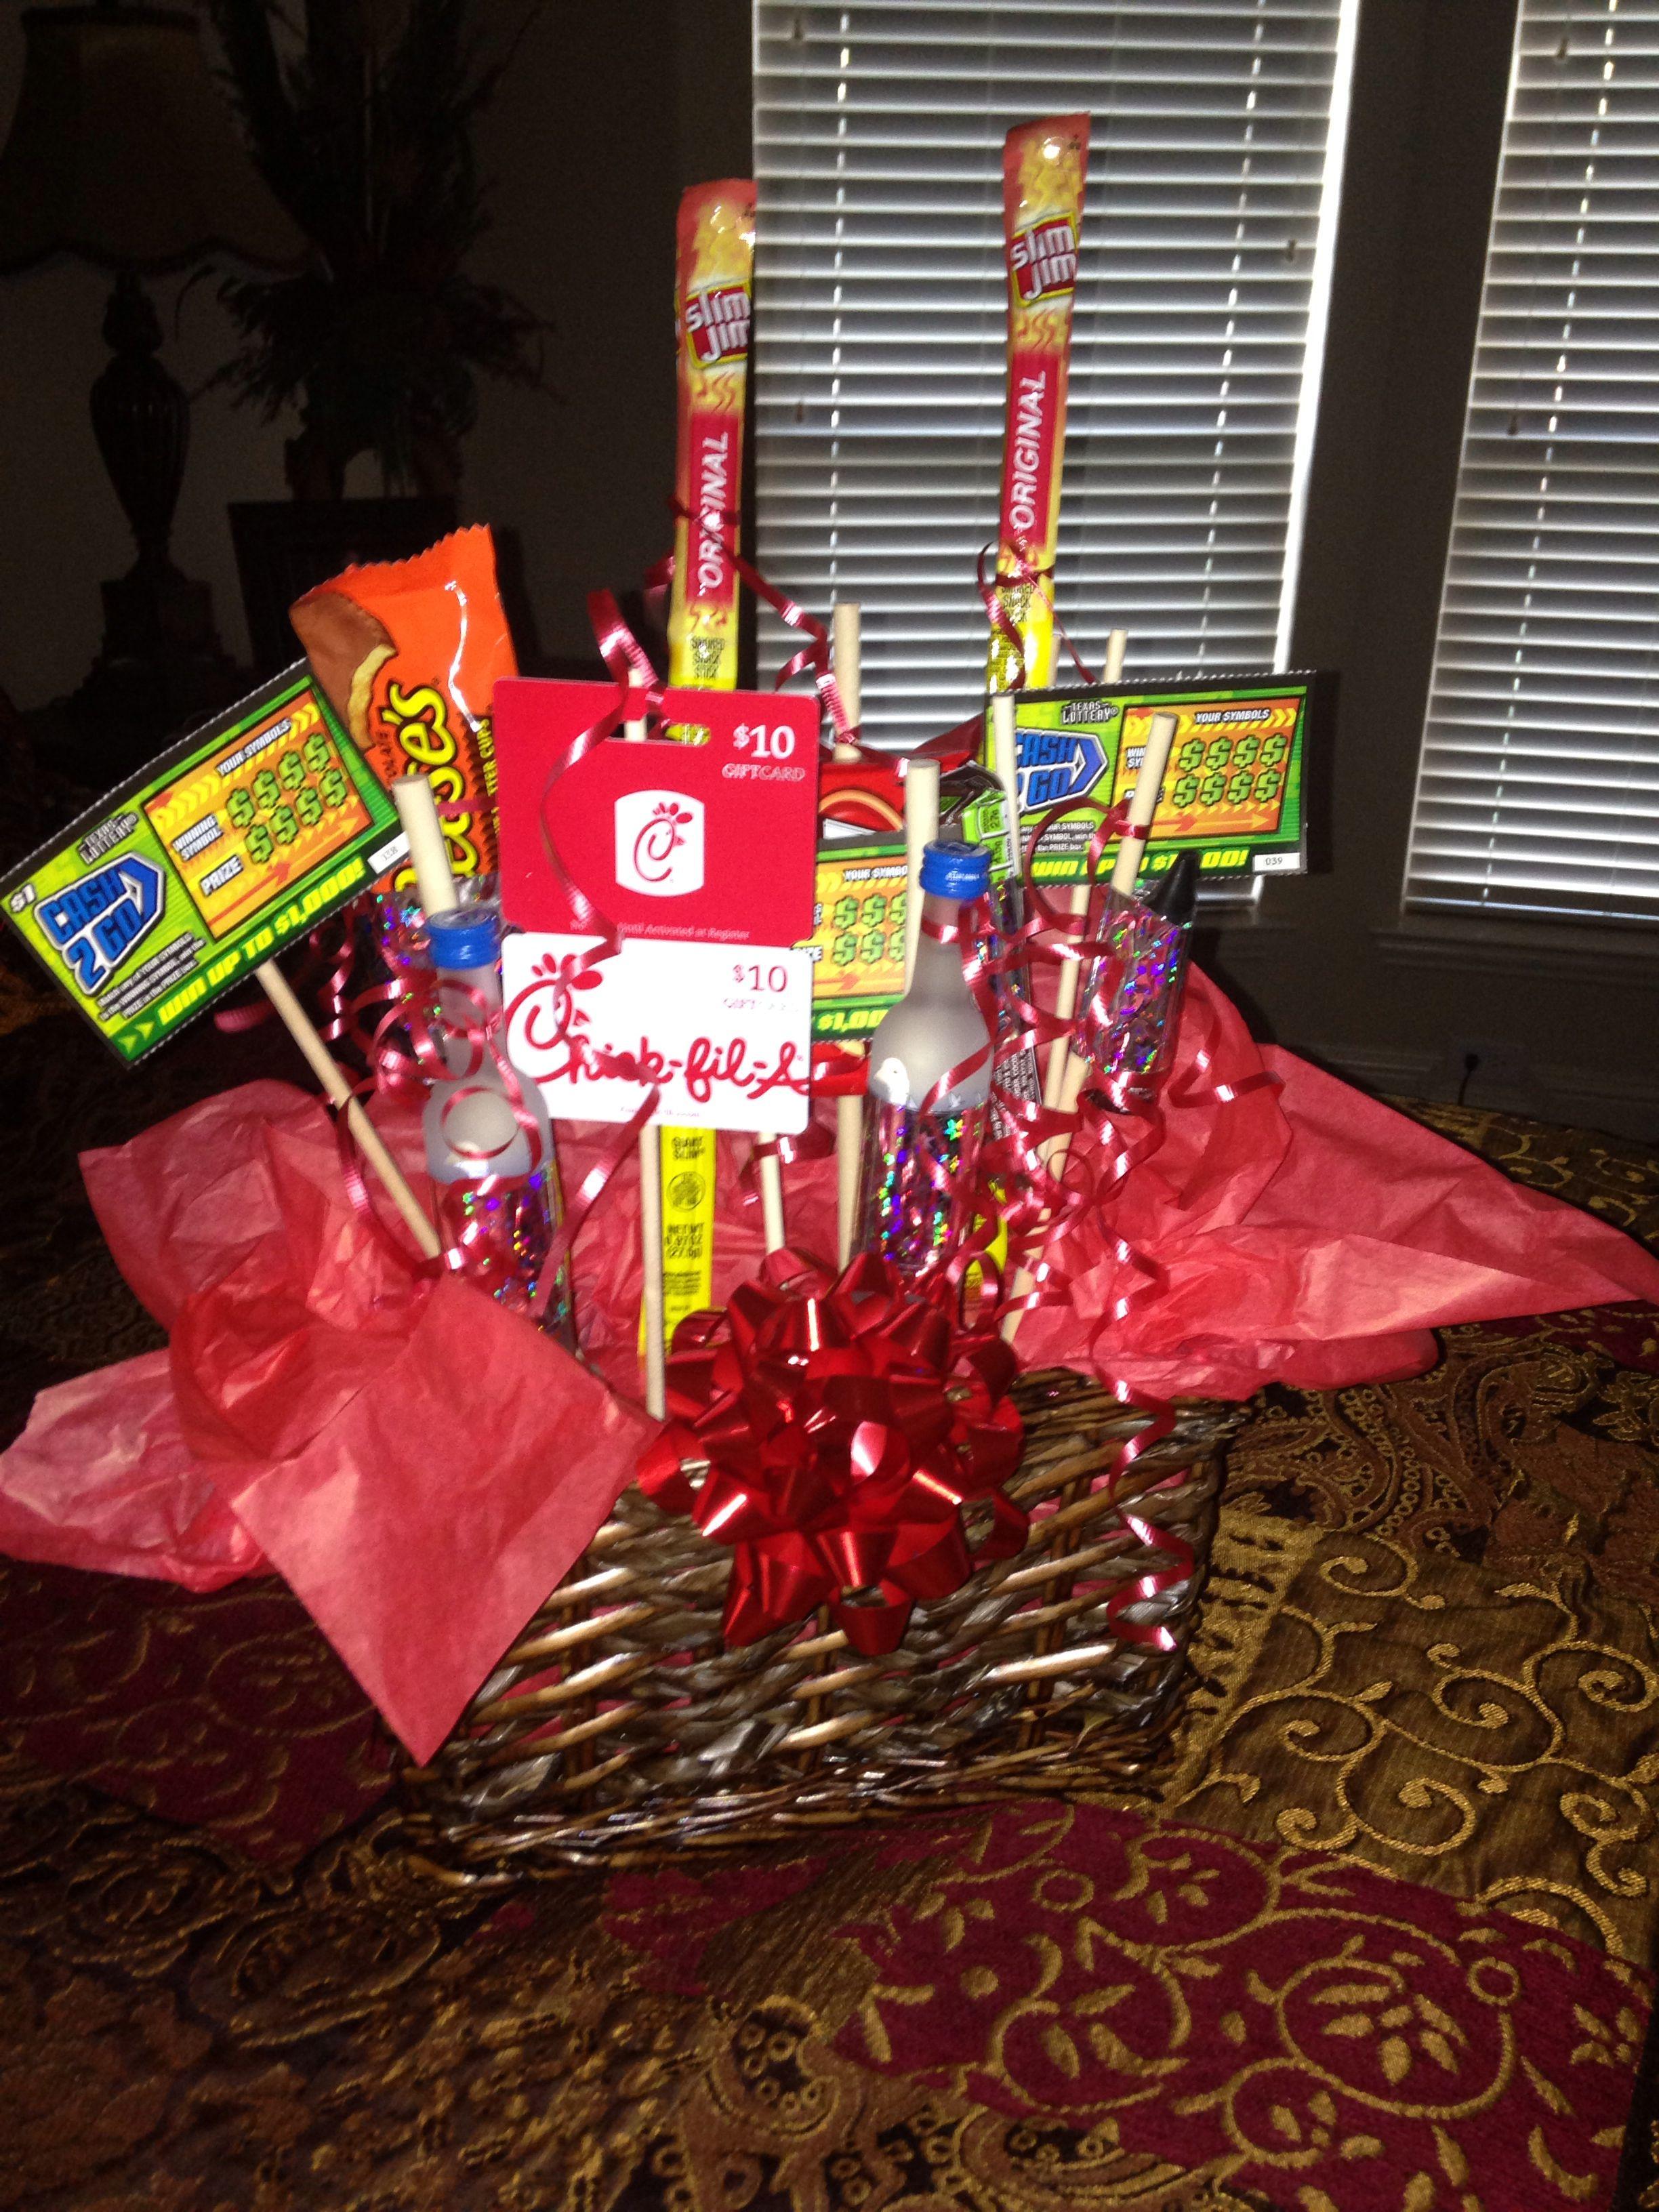 Pin By Squirrelycraft On Boyfriend Things Goodie Basket Boyfriend Birthday Boyfriends Birthday Ideas